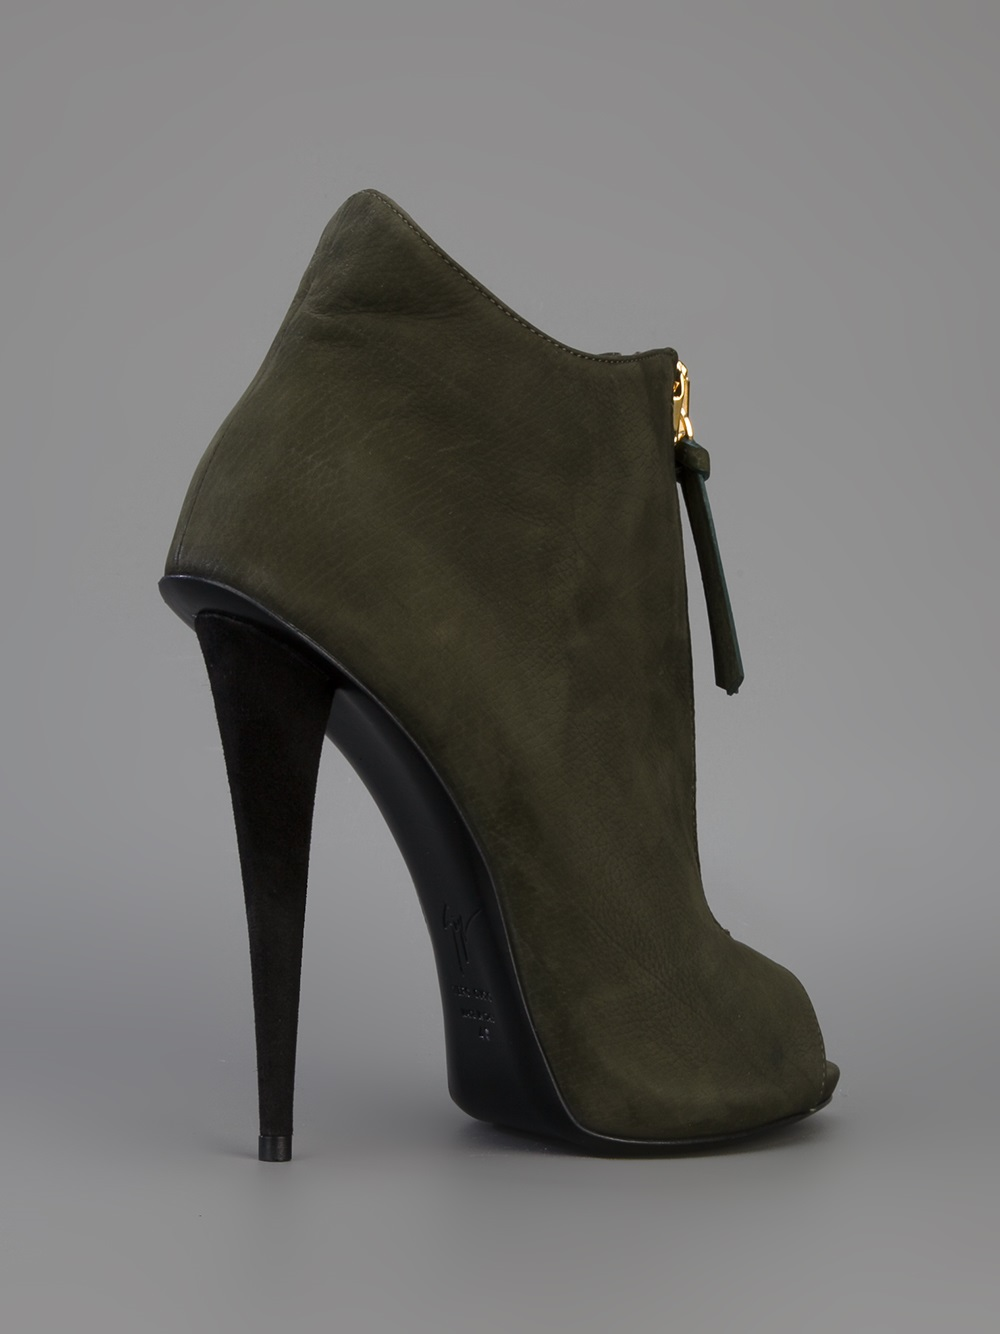 Lyst Giuseppe Zanotti Peep Toe Ankle Boot In Green